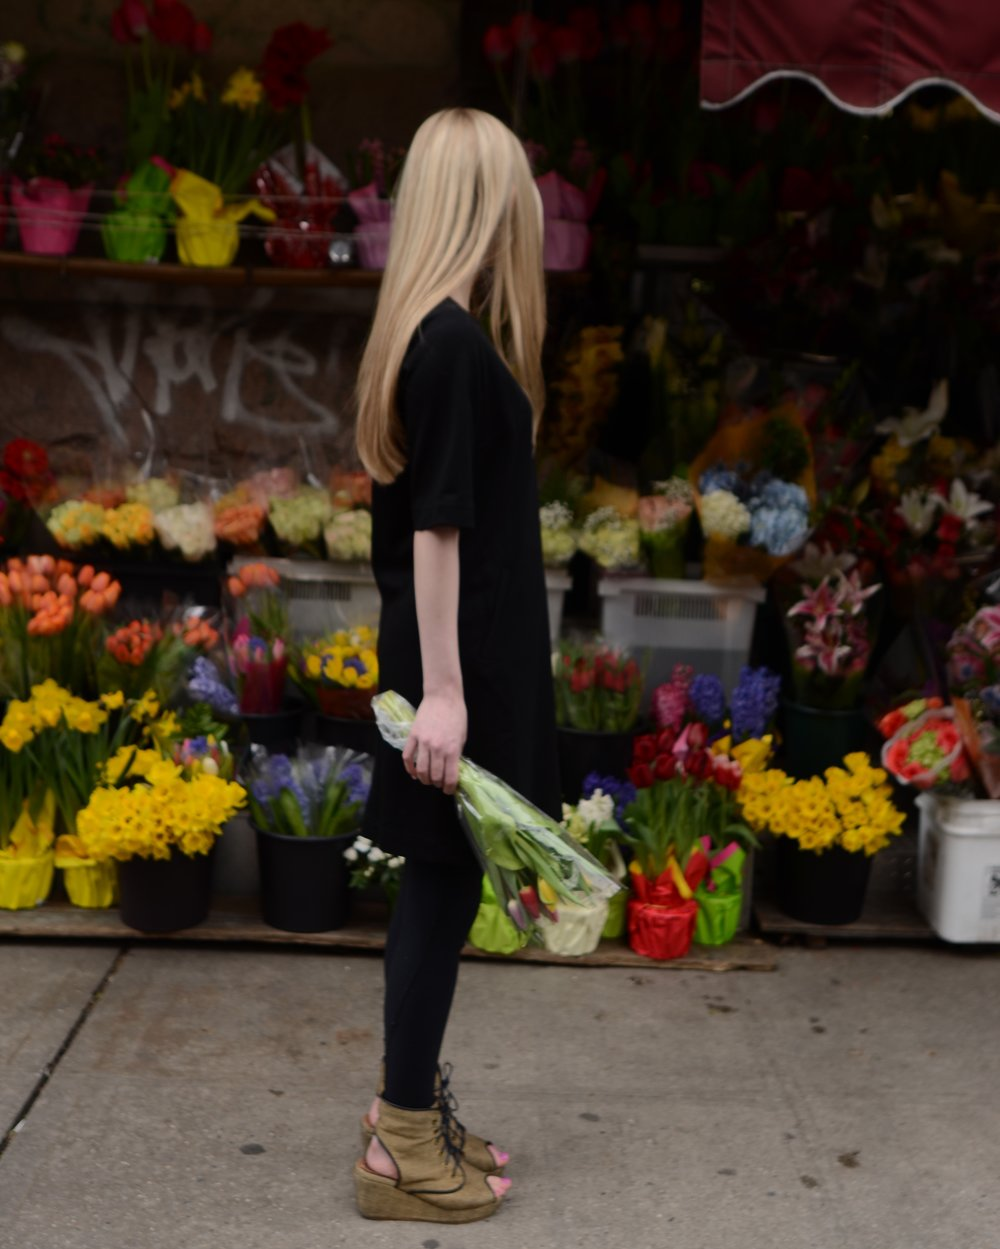 Grocery Store, Manhattan  March 2016